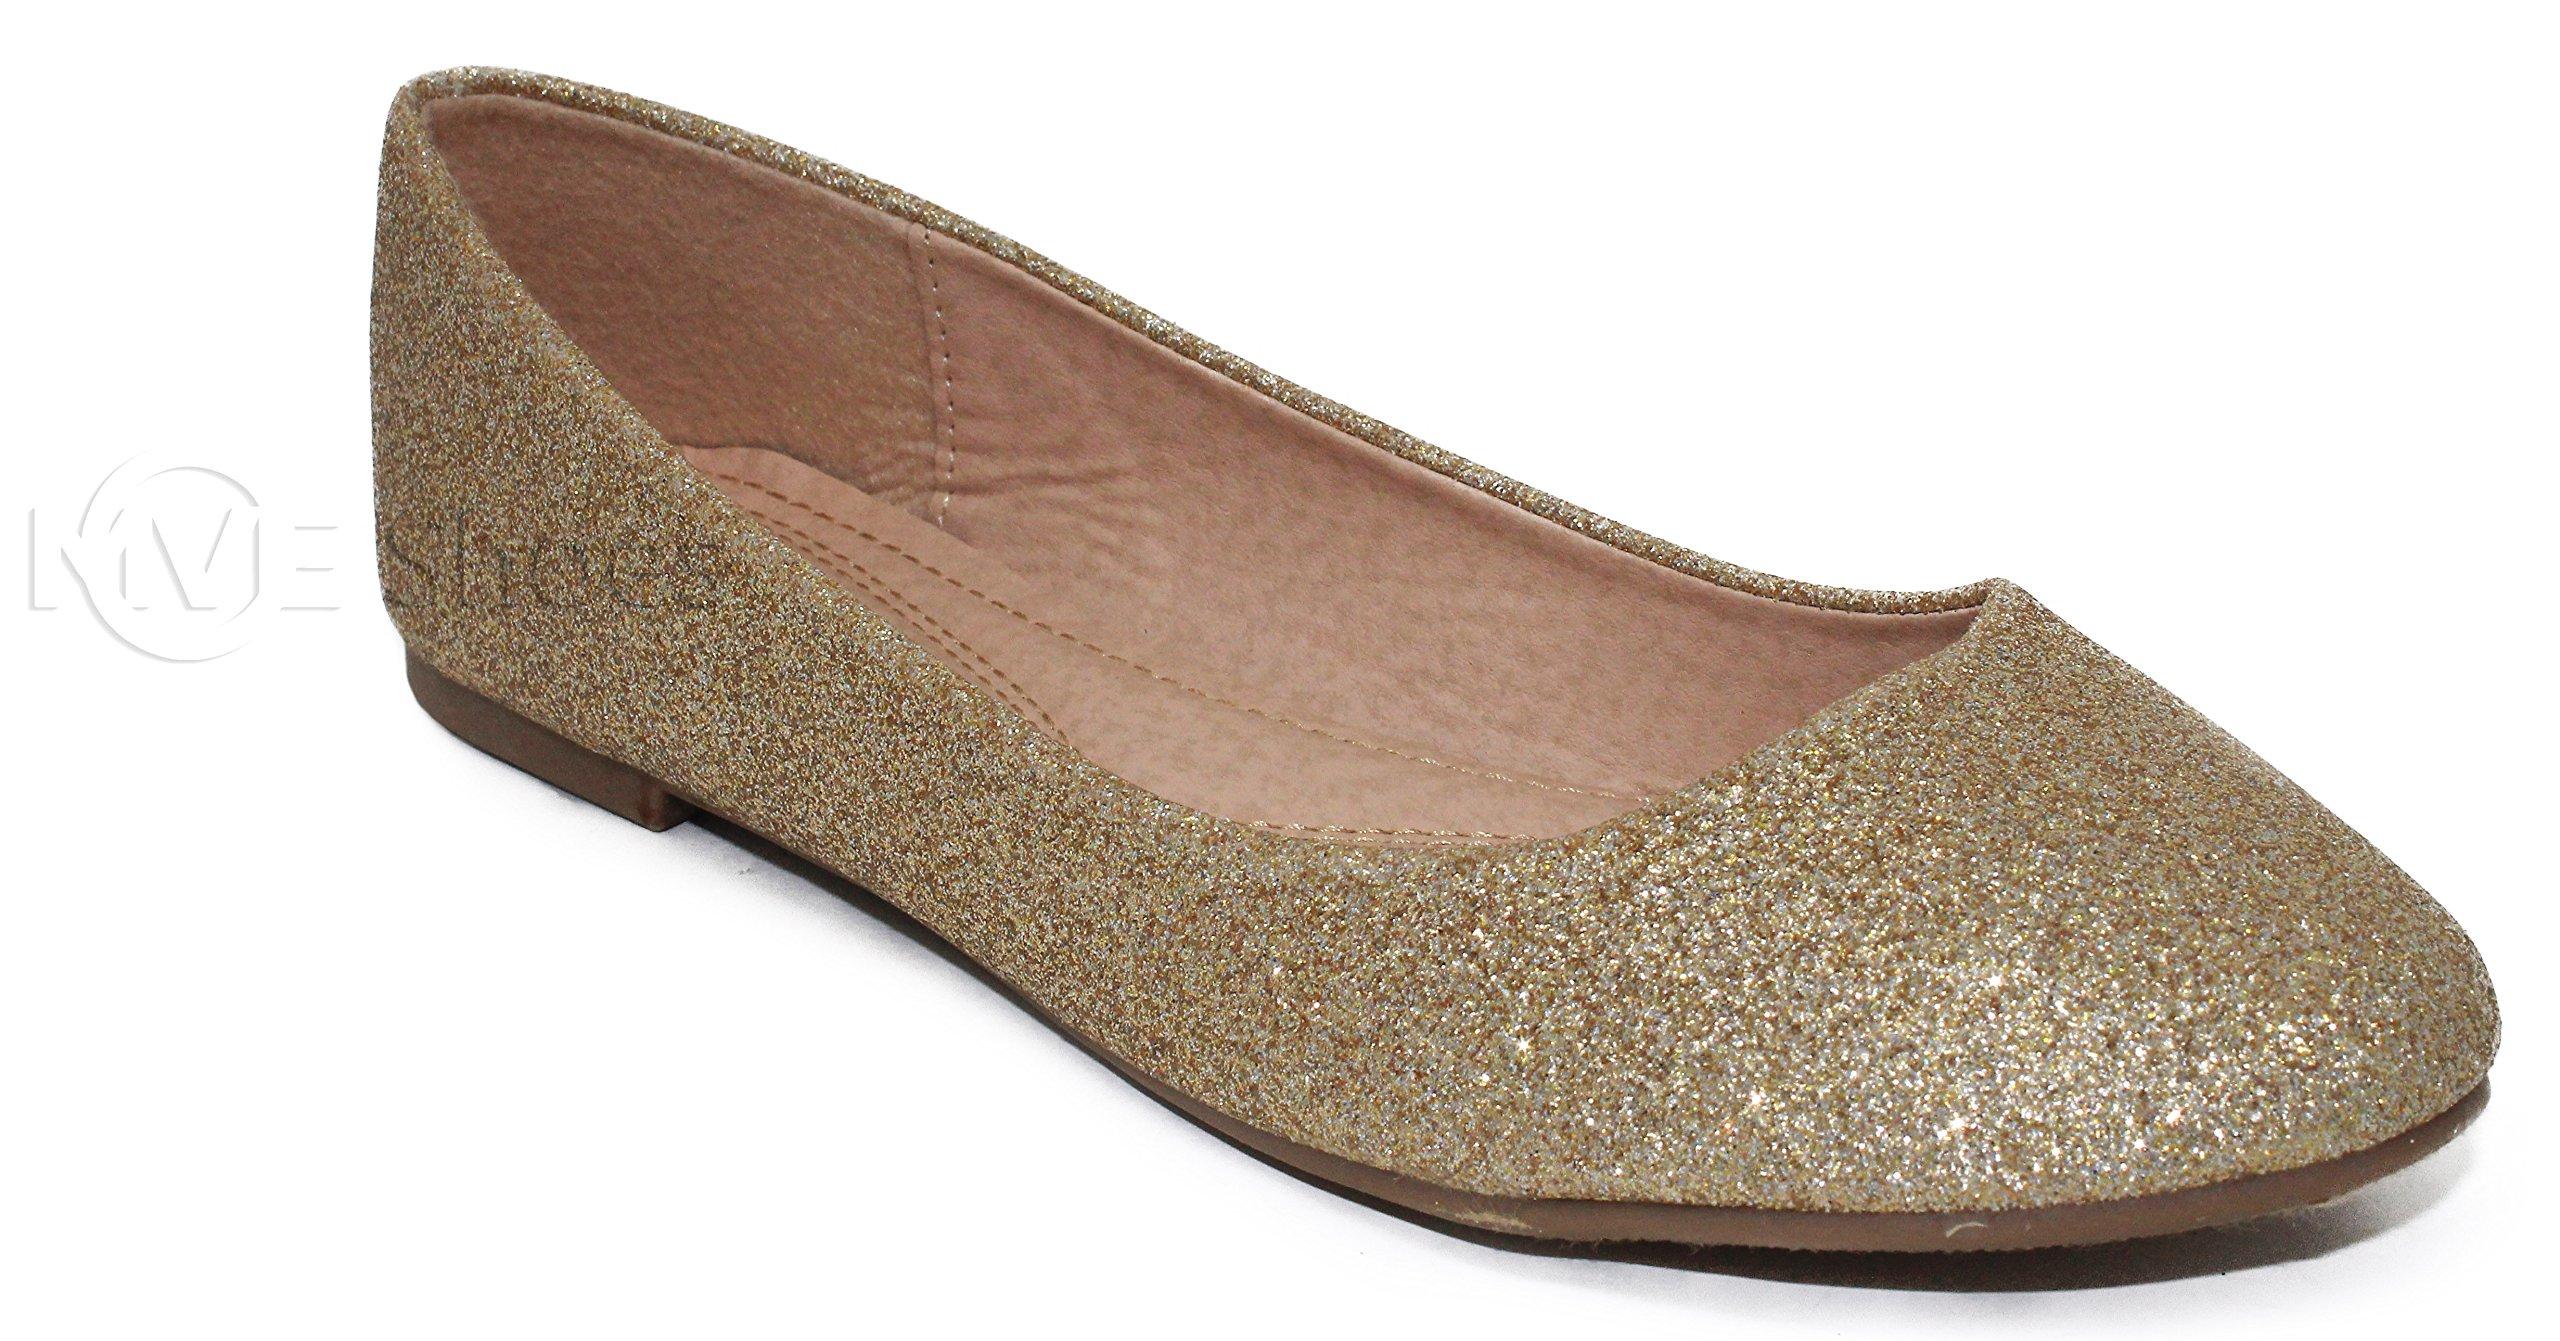 MVE Shoes Women's Crystal Rhinestone Slip On- Formal Glitter Flats- Dress Shoes Maryjane-Shiny Glitter Ballet Flats - Dress Ballerina Sparkle Wedding